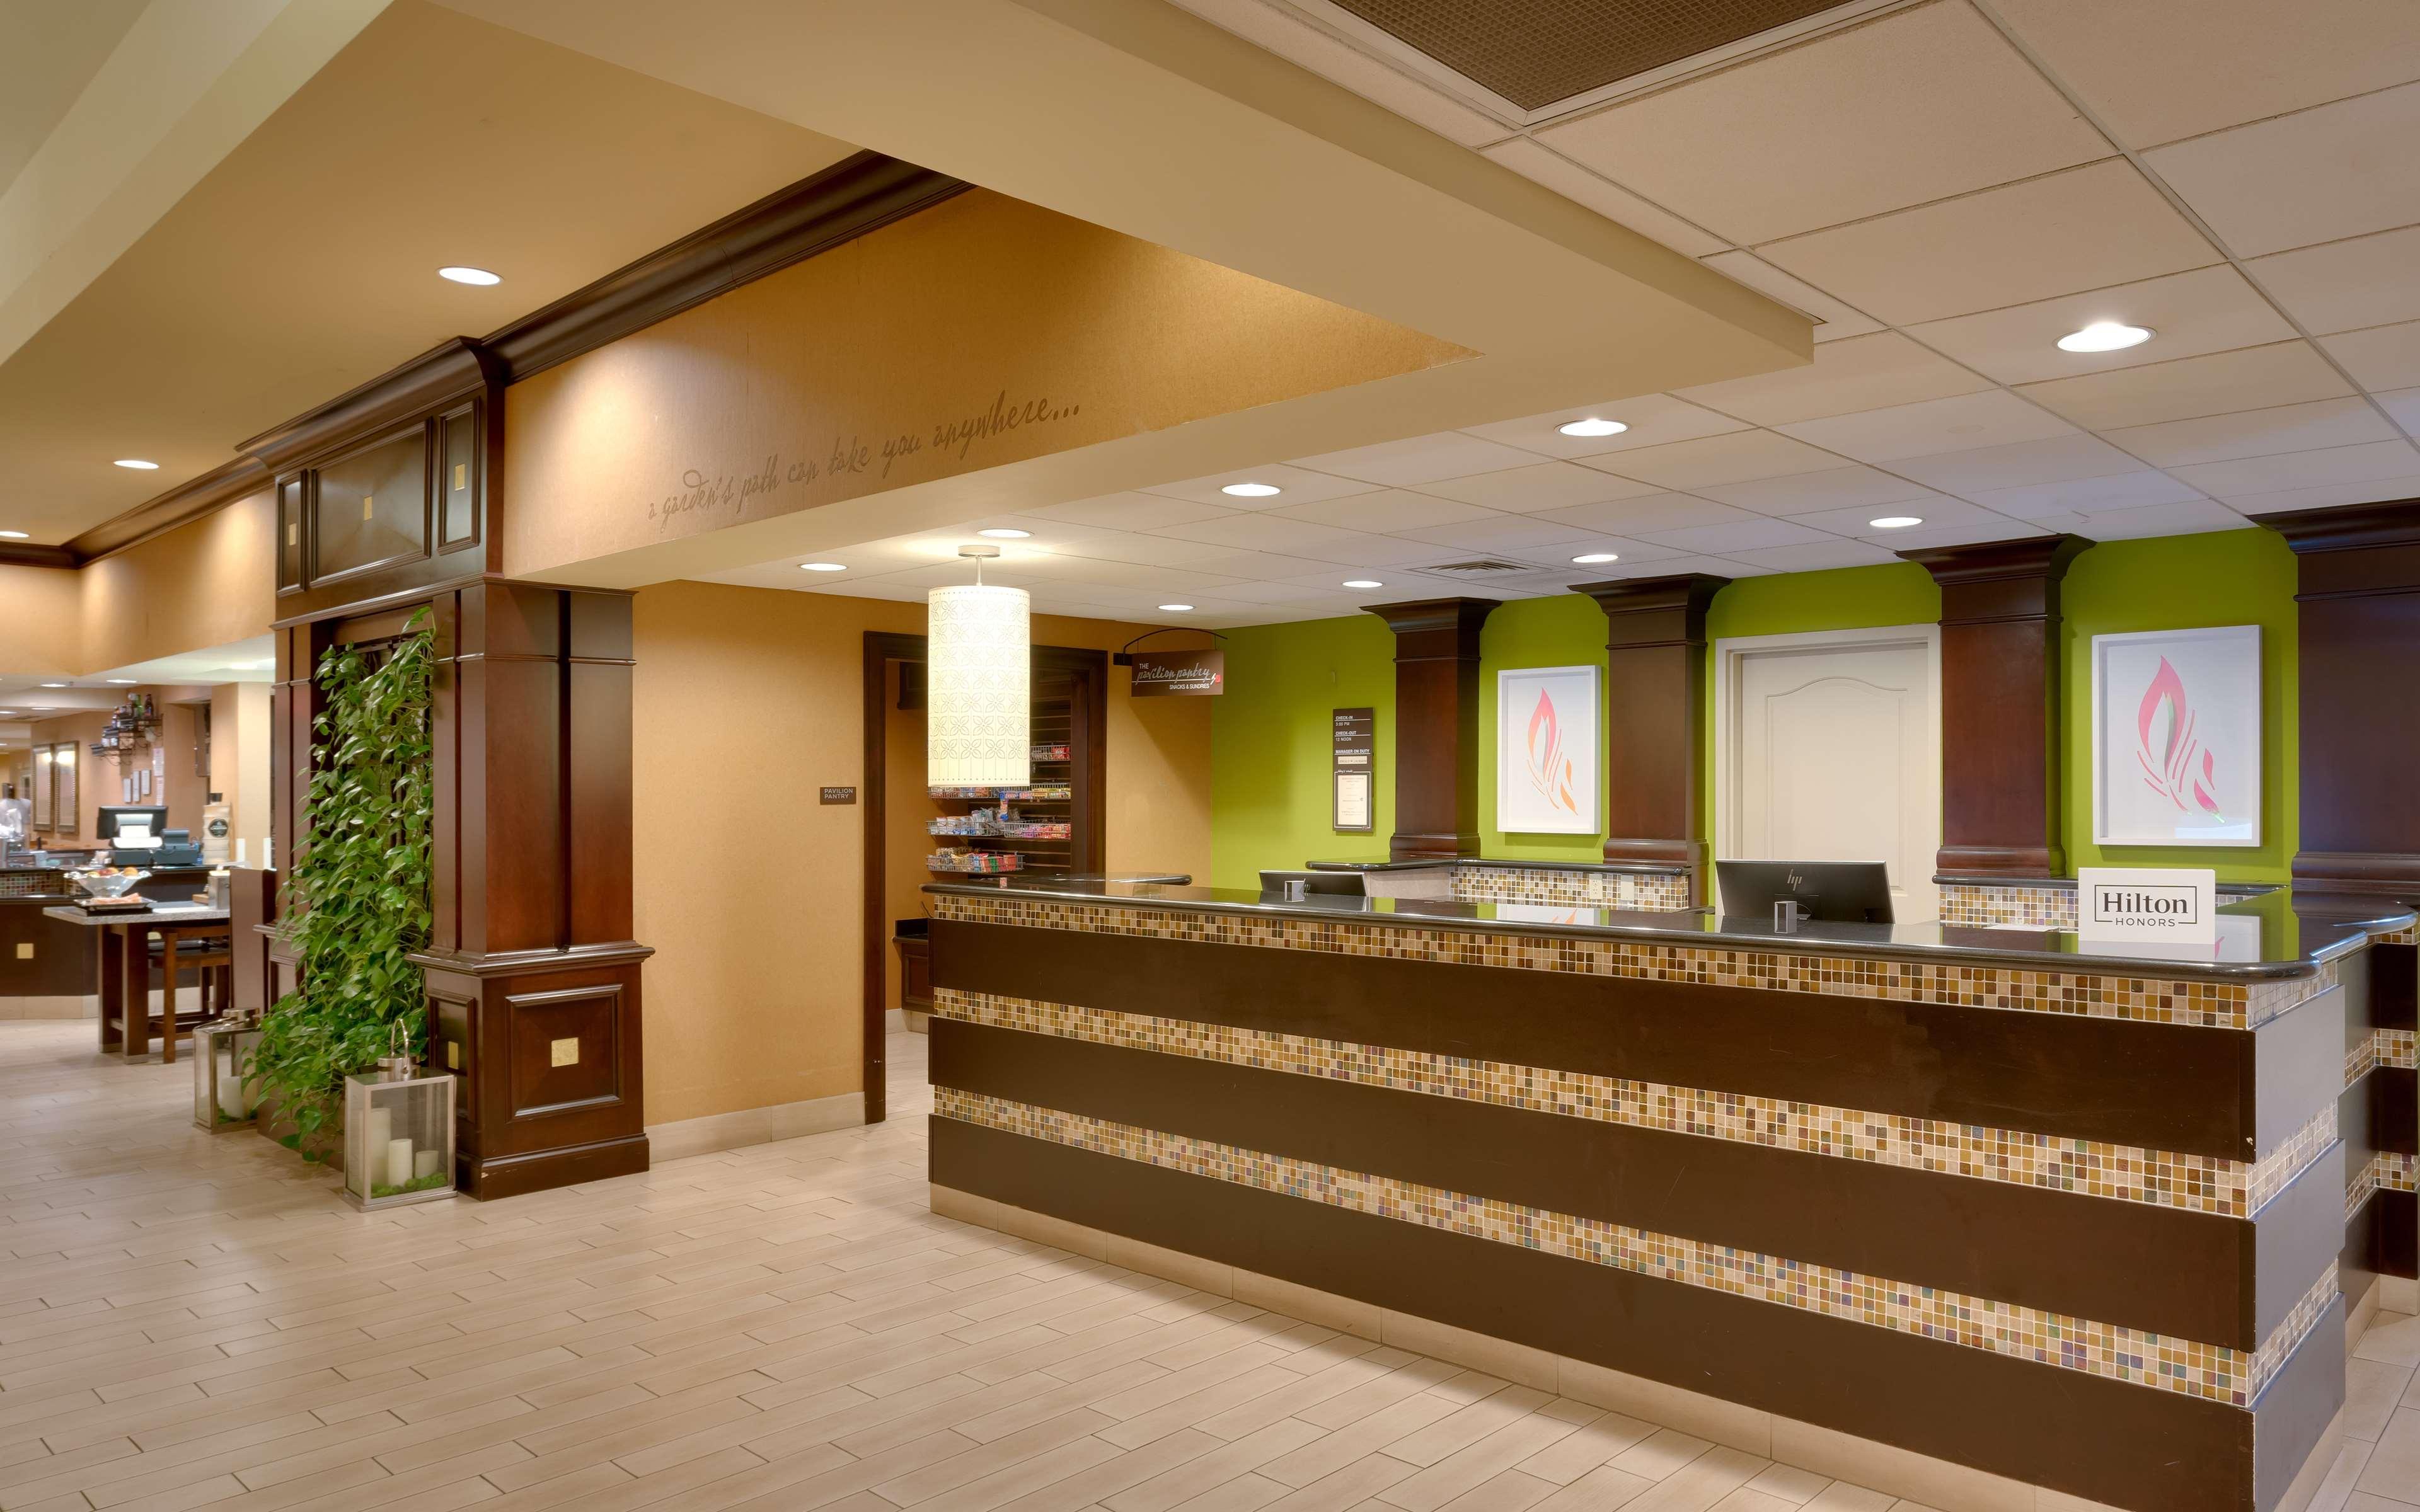 Hilton Garden Inn Clarksville image 5